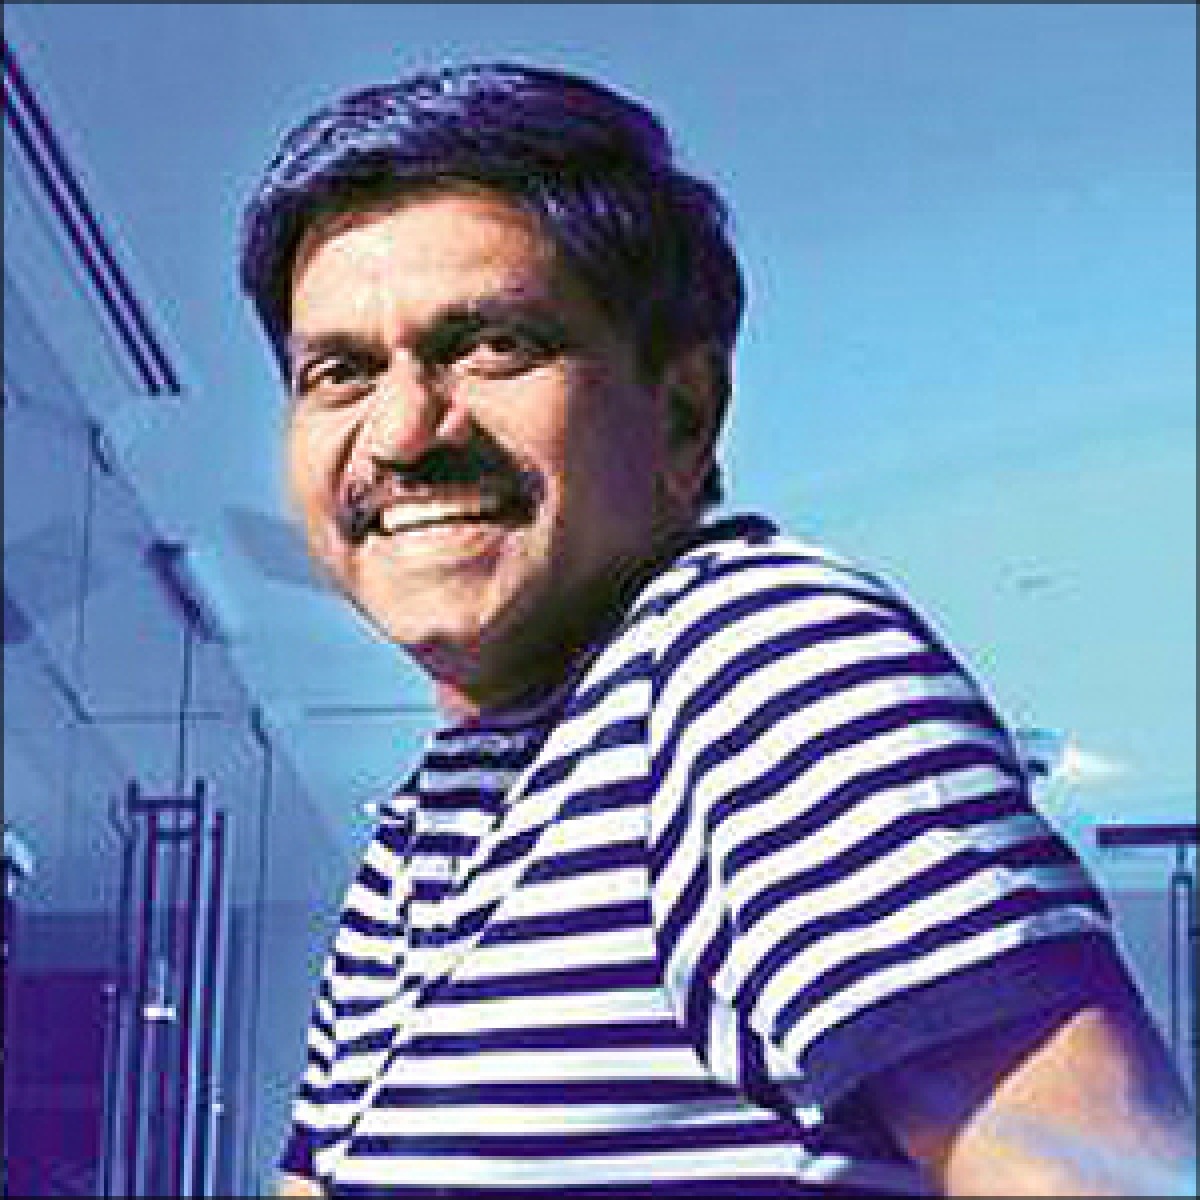 Pepsico India's D Shivakumar to join Aditya Birla Group soon